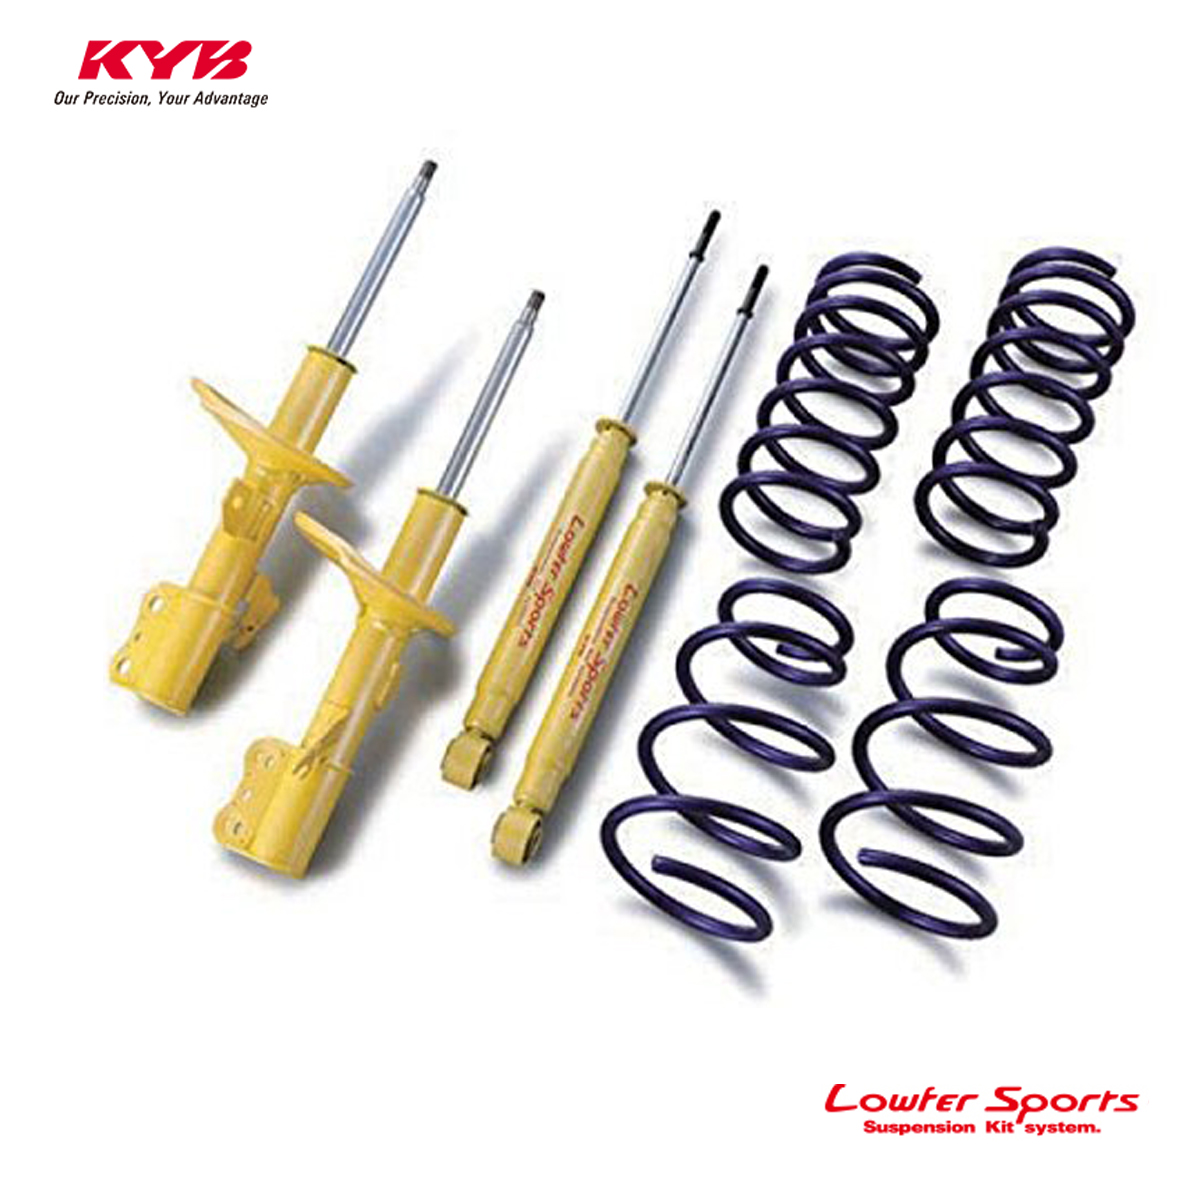 KYB カヤバ ワゴンR CT21S ショックアブソーバー サスペンションキット Lowfer Sports LKIT-CT21S 配送先条件有り